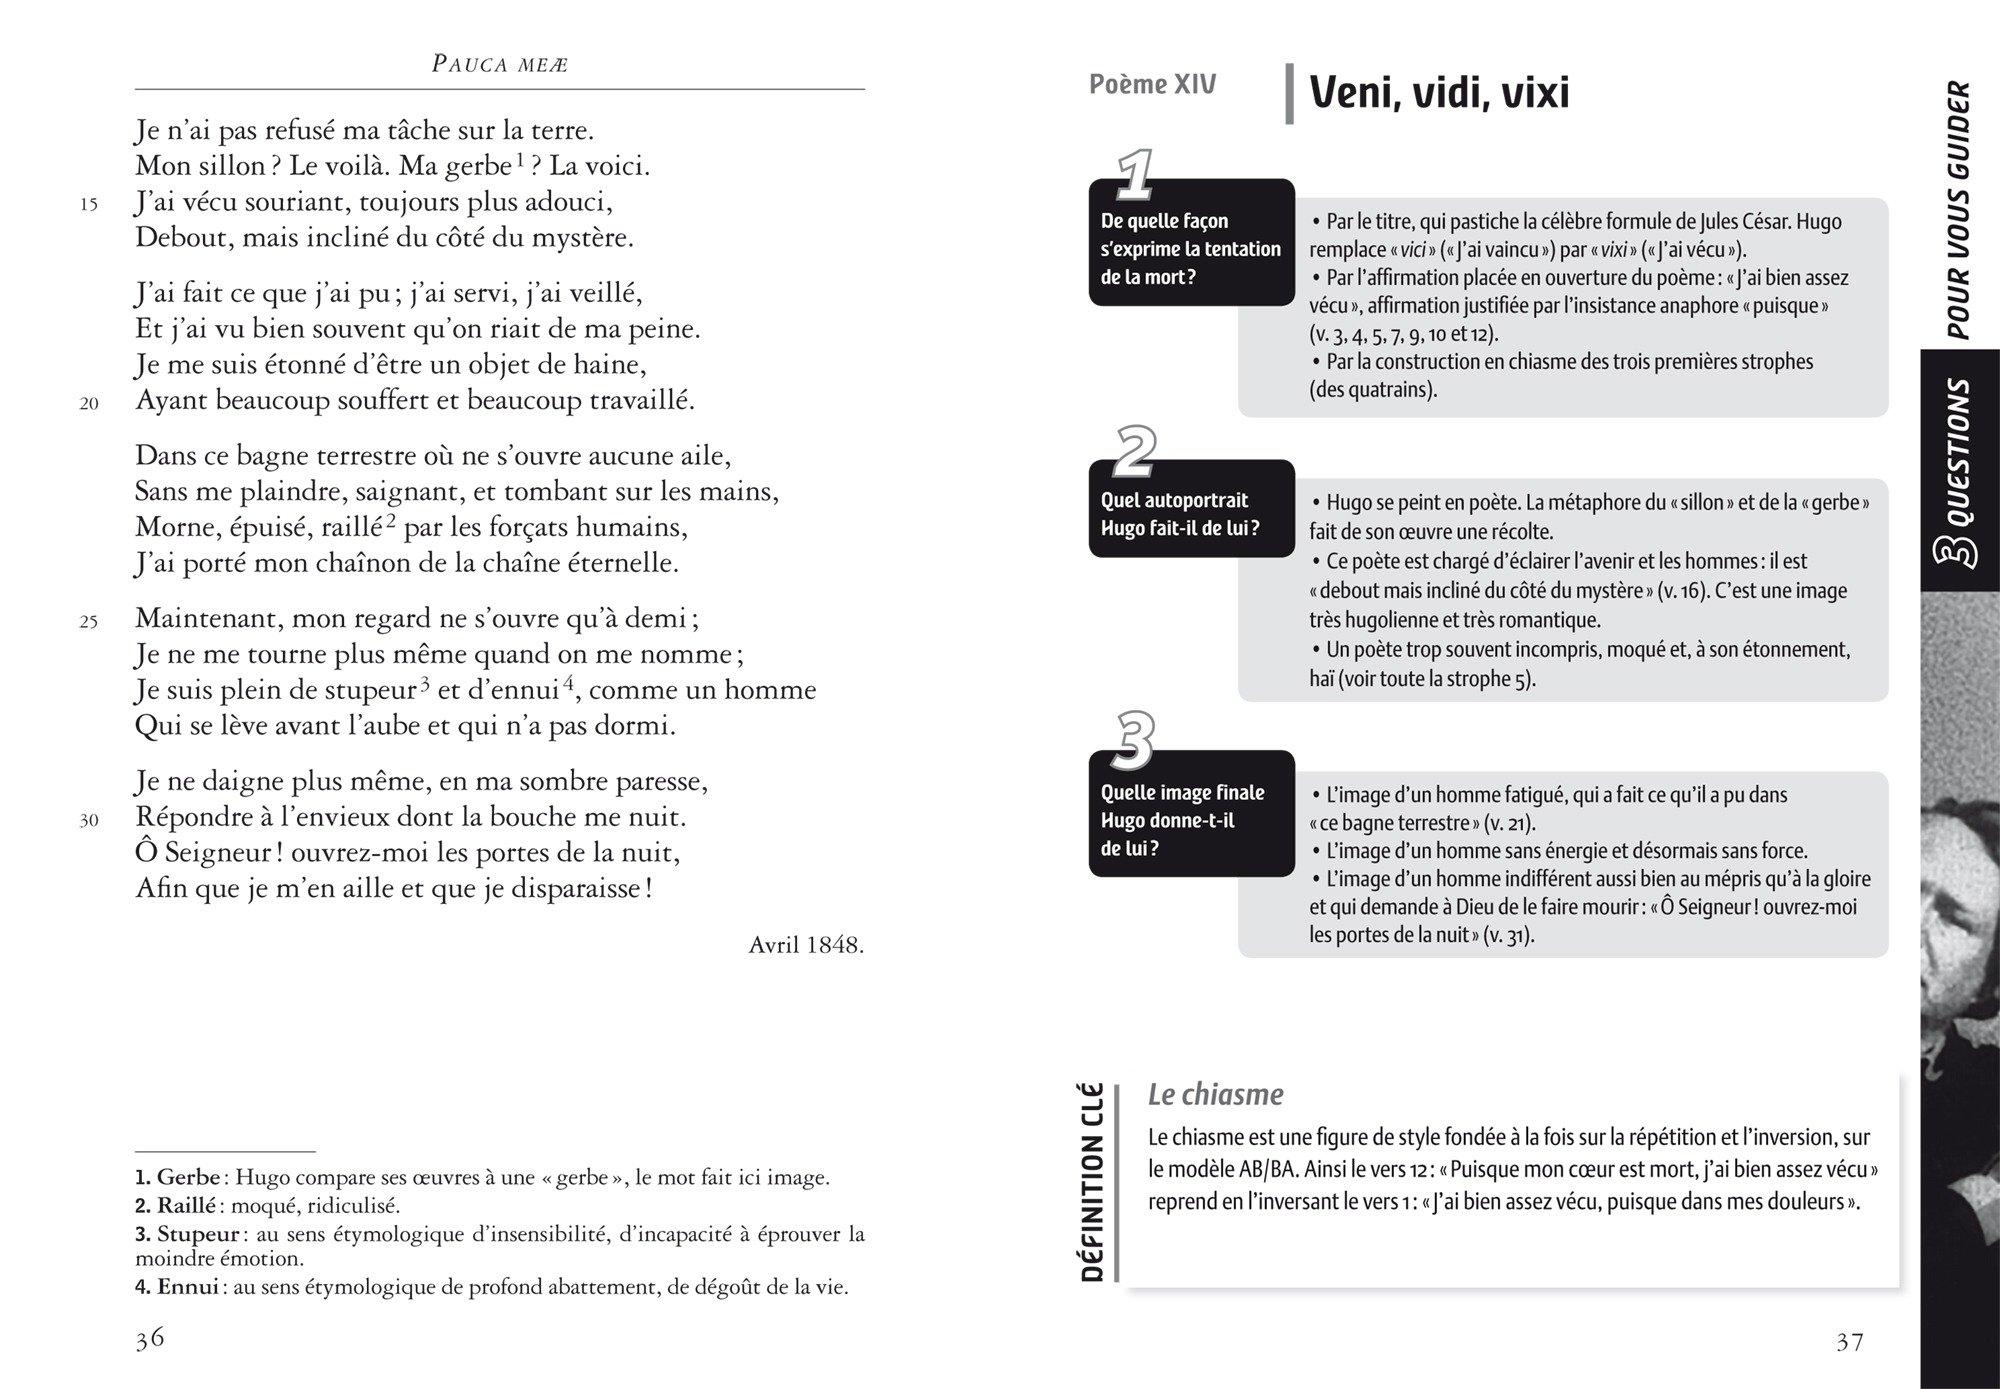 poeme 4 pauca meae analyse